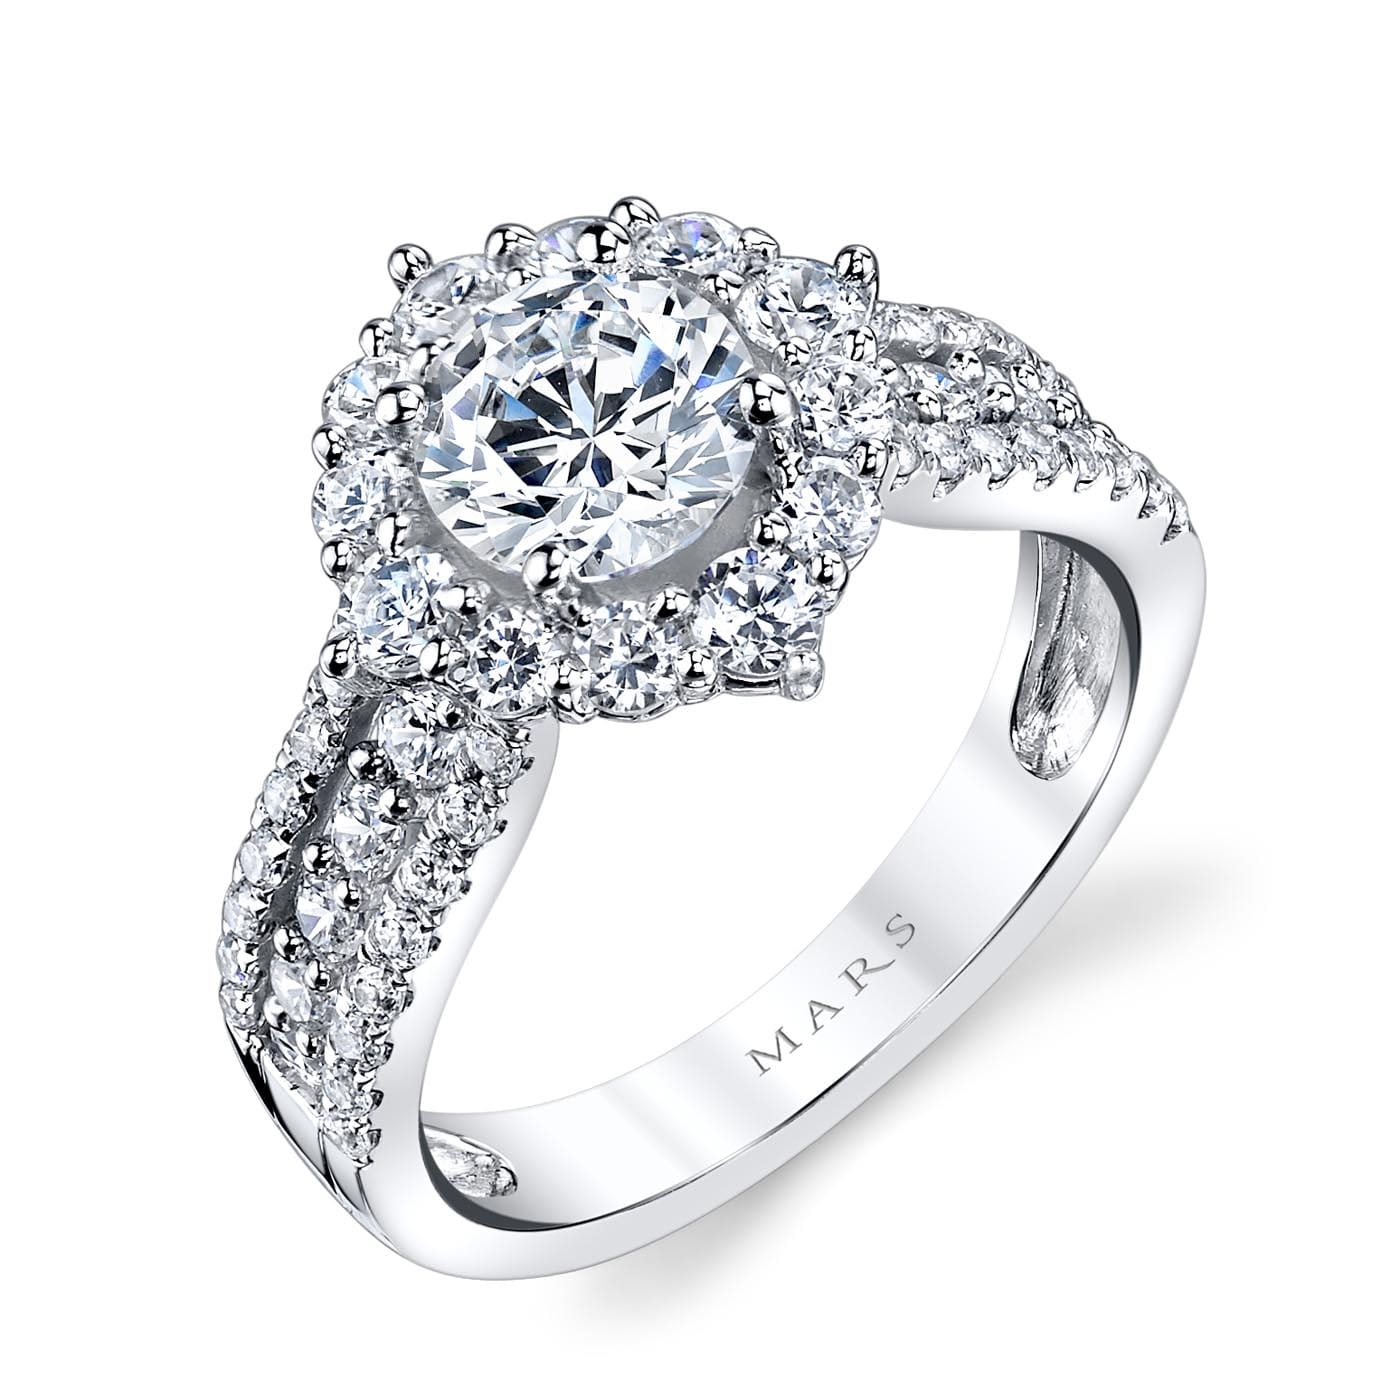 Halo Engagement RingStyle #: MARS 25644